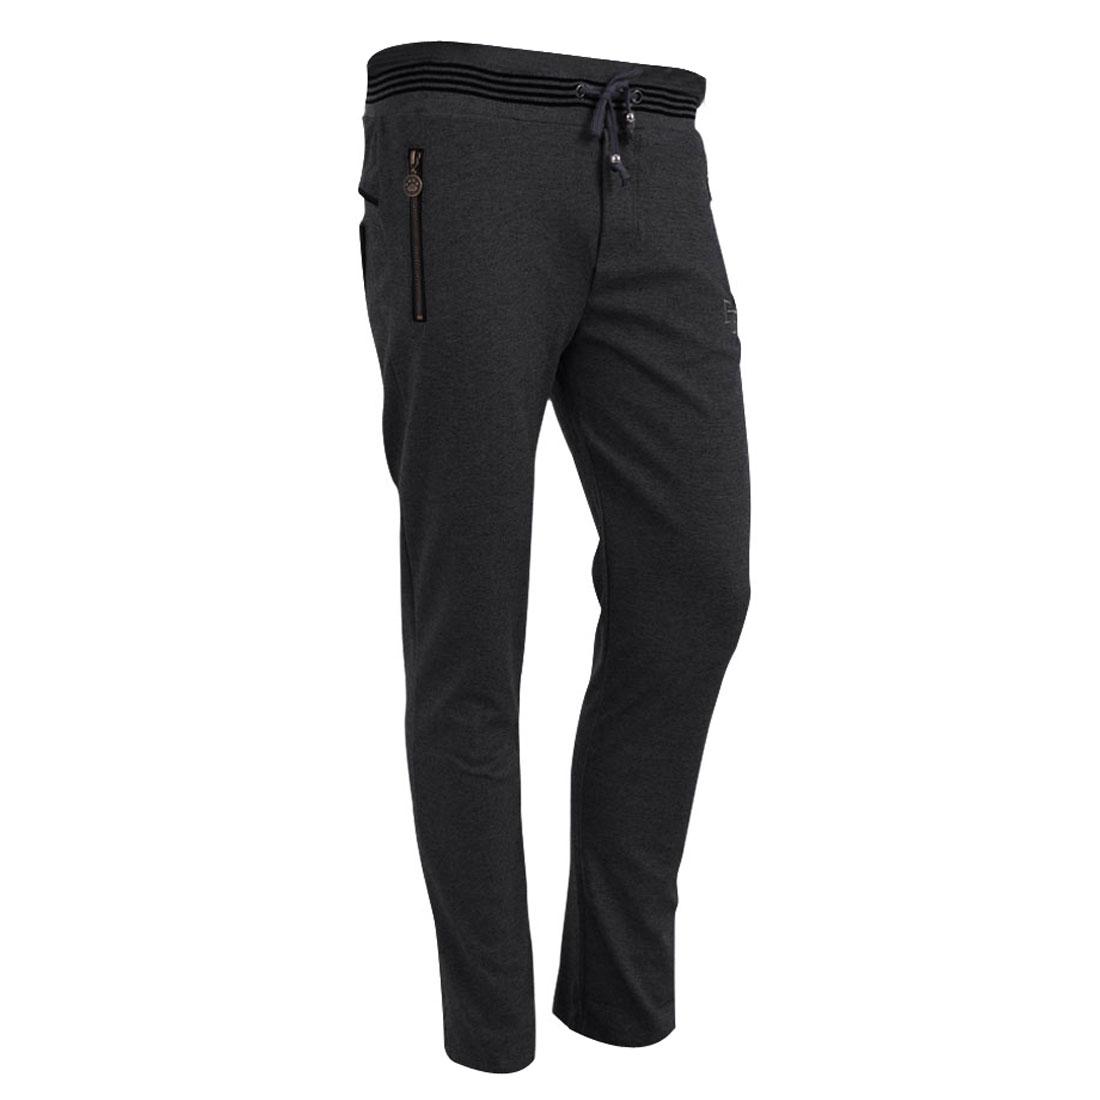 Man Drawstring Zippers Decor Hip Pockets Long Chic Trousers Dark Gray W28